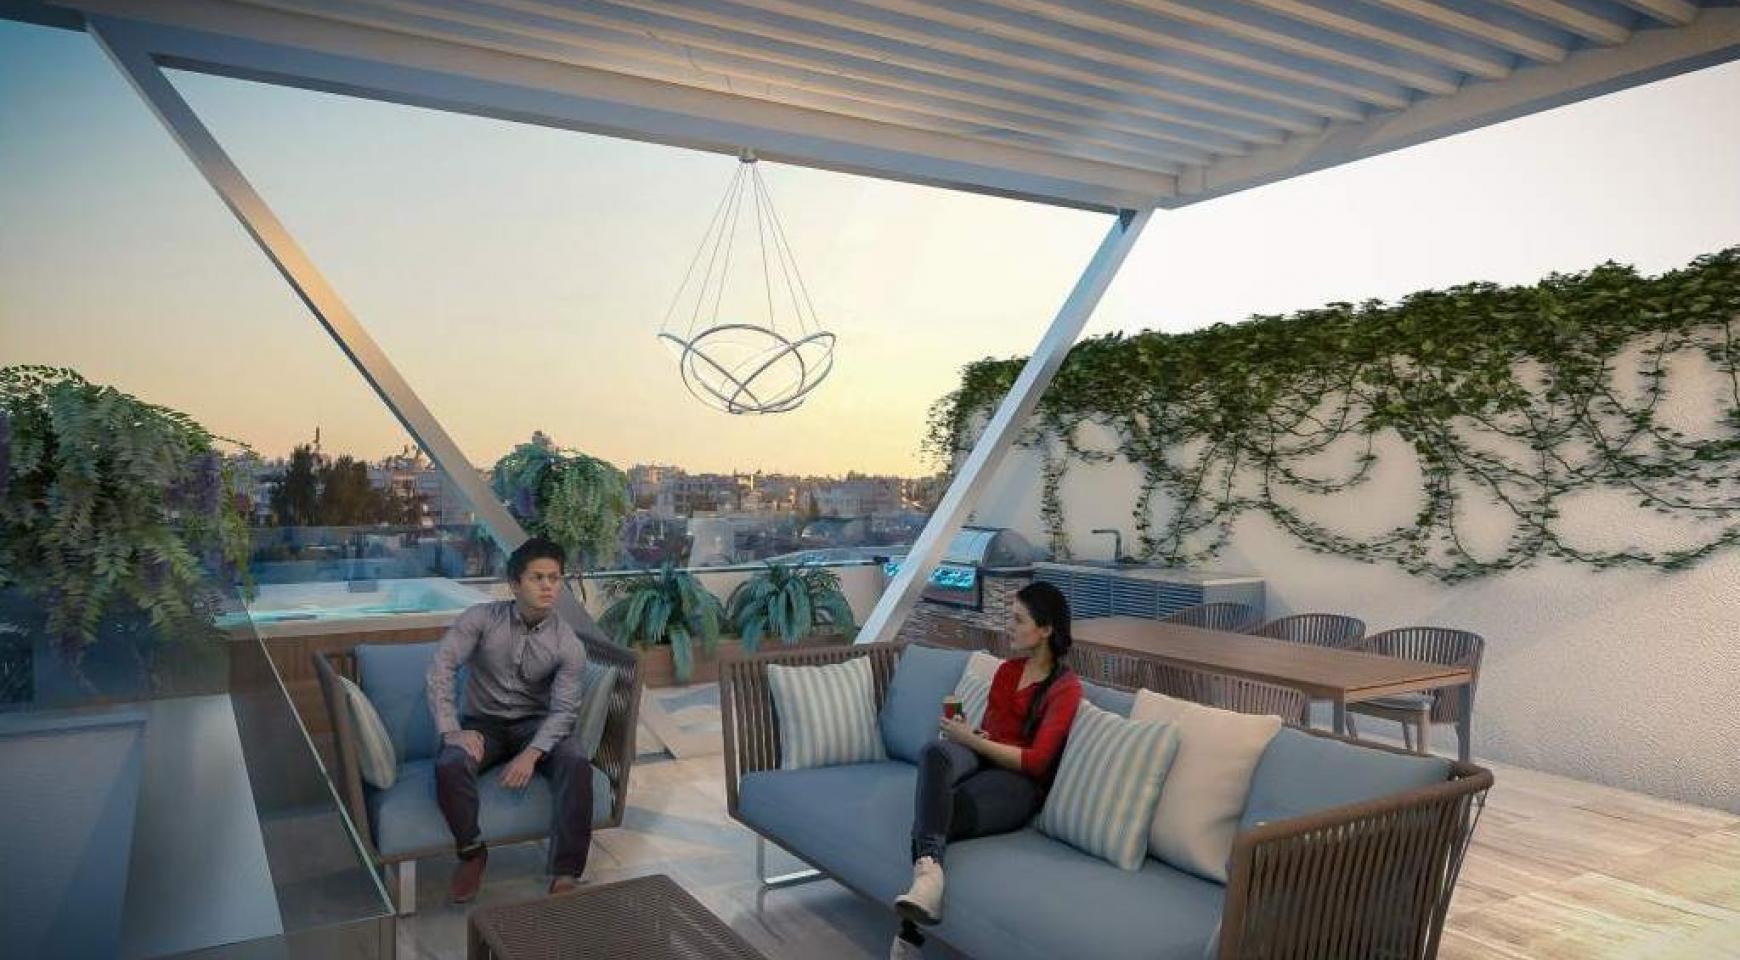 New 2 Bedroom Apartment in a Contemporary Complex near the Sea - 9